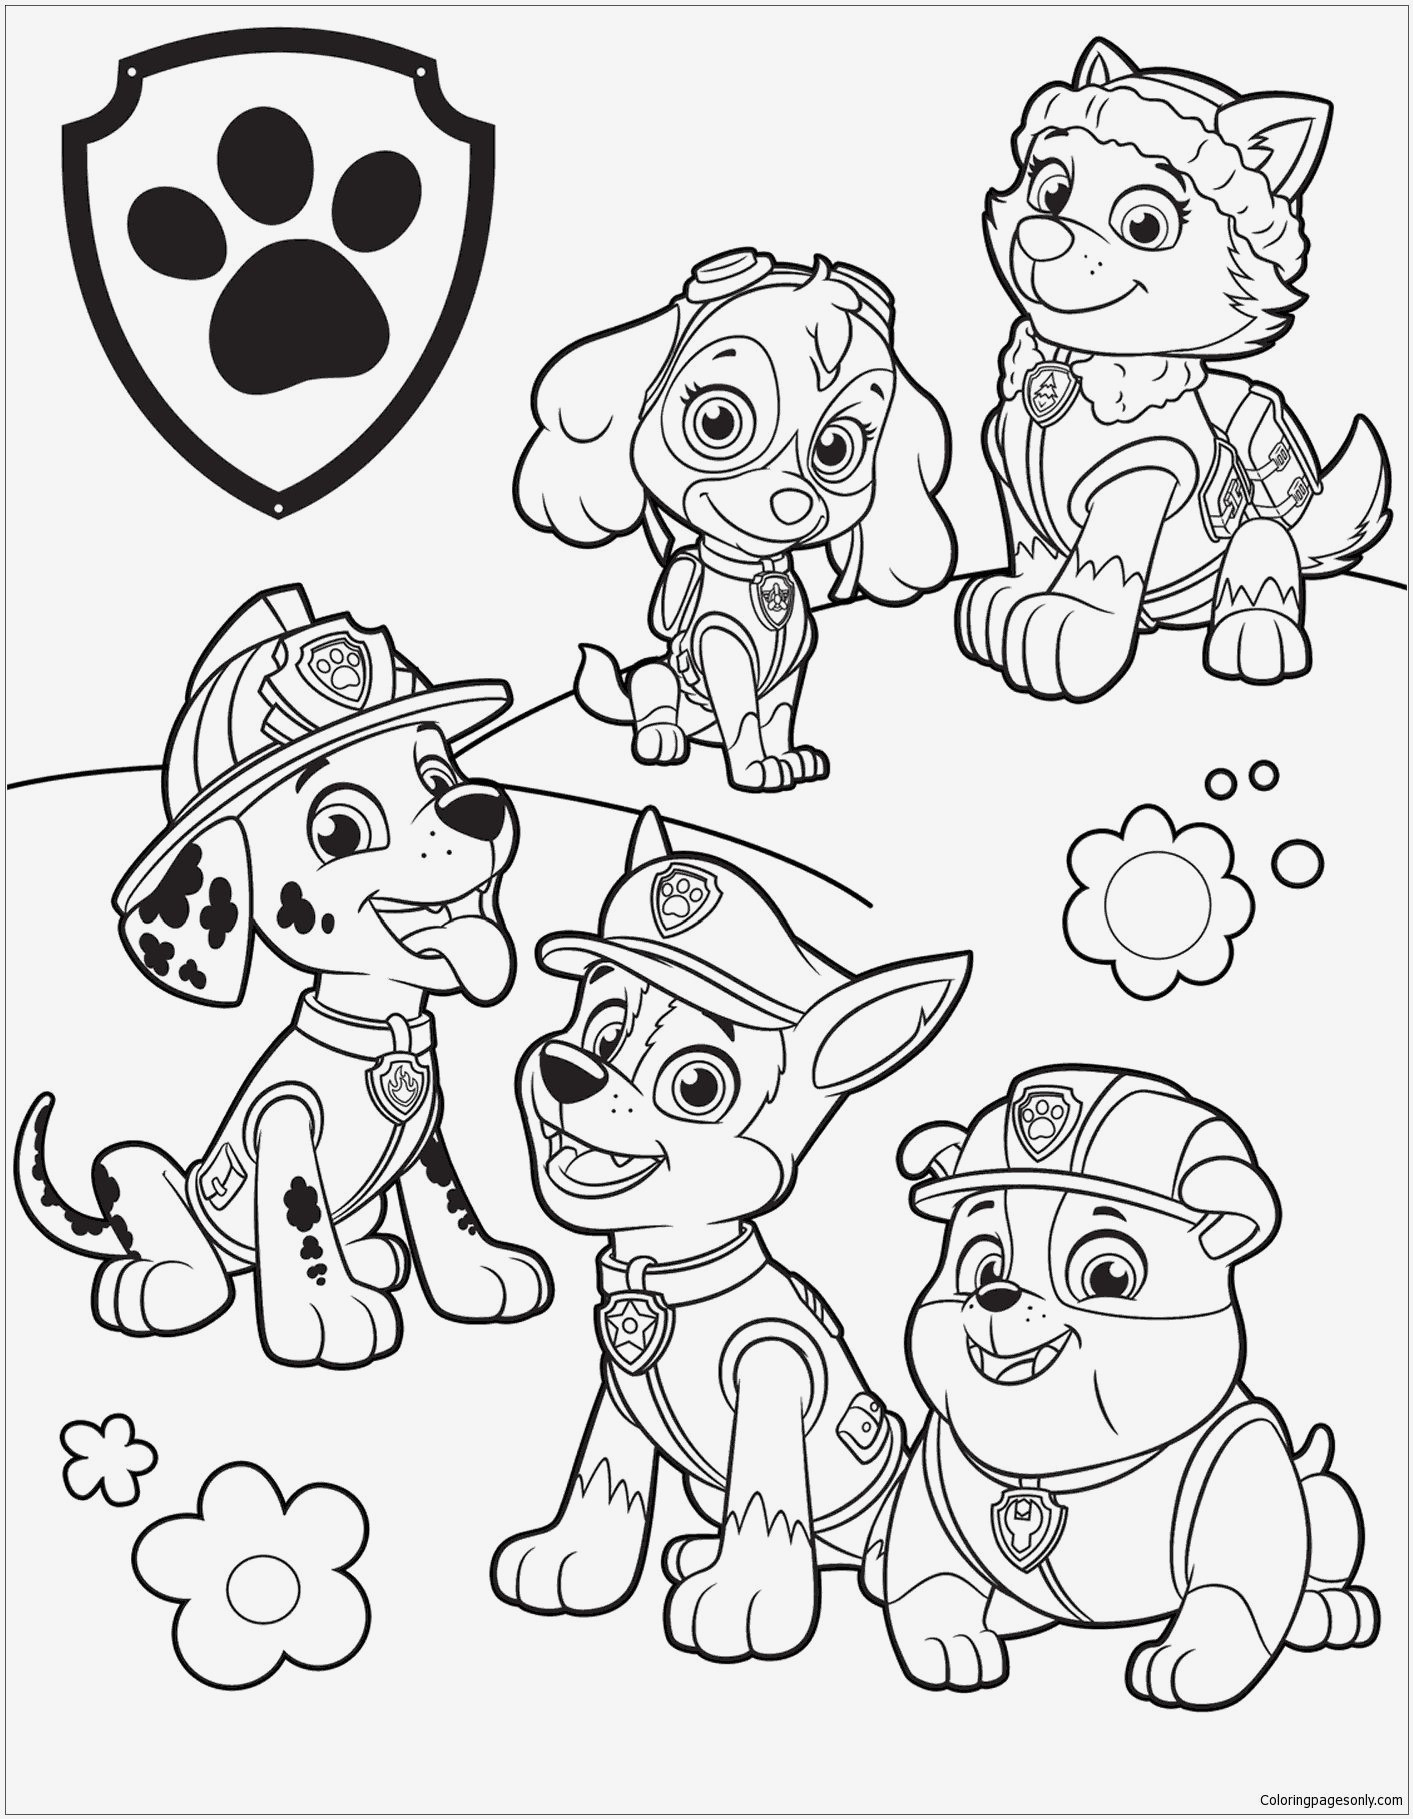 Paw Patrol Ausmalen Einzigartig 50 Best Coloring Pages Paw Patrol Pics 1136 Neu Paw Patrol Rocky Sammlung